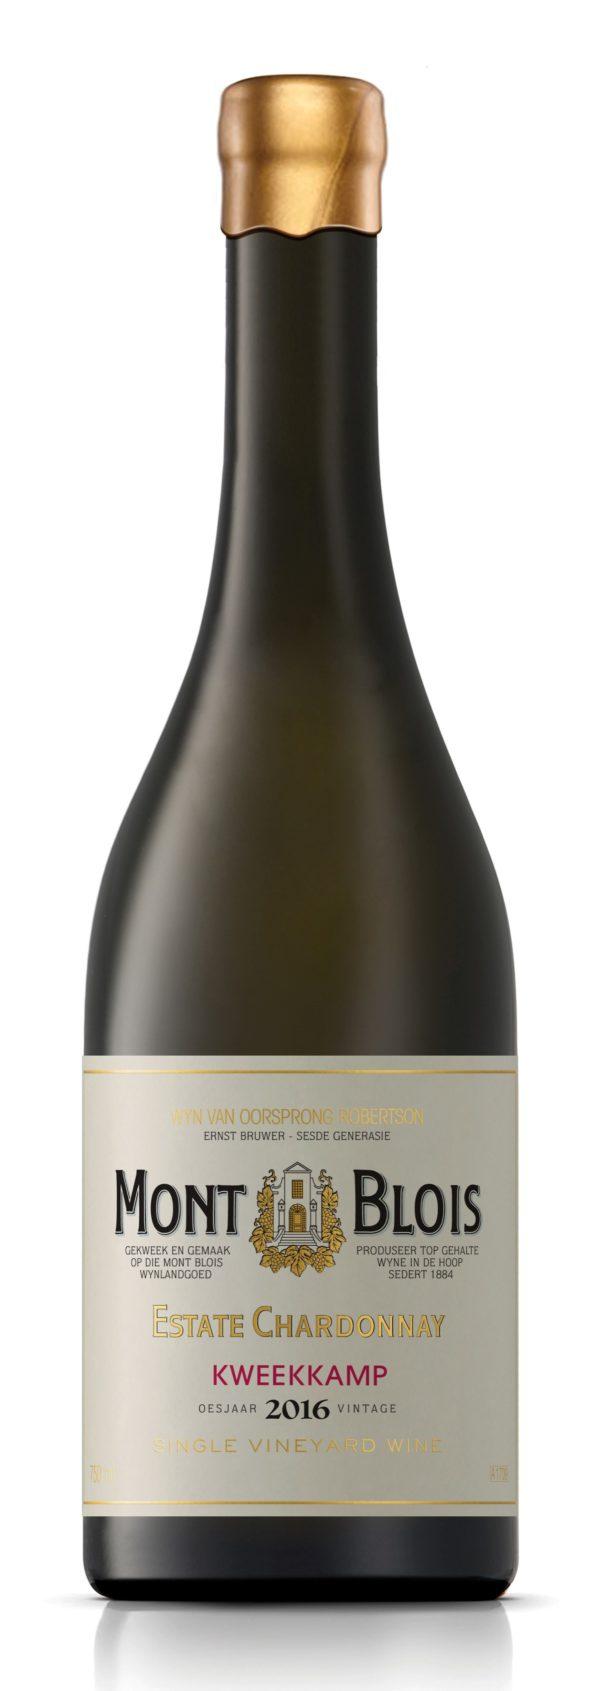 Mont Blois Chardonnay Kweekkamp 2016